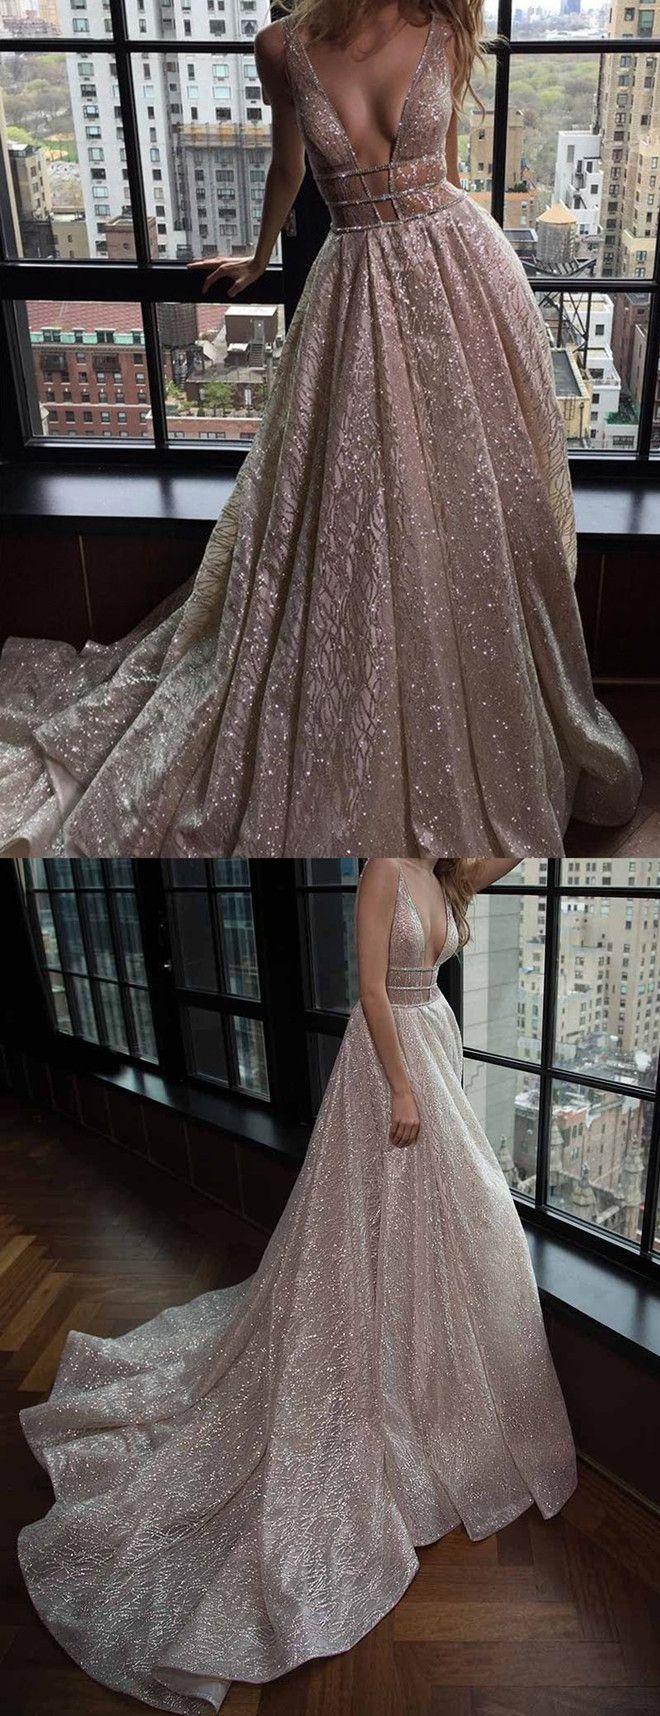 cut out dresses,2017 prom dresses,sexy prom dresses,deep v-neck dresses,luxury prom dresses